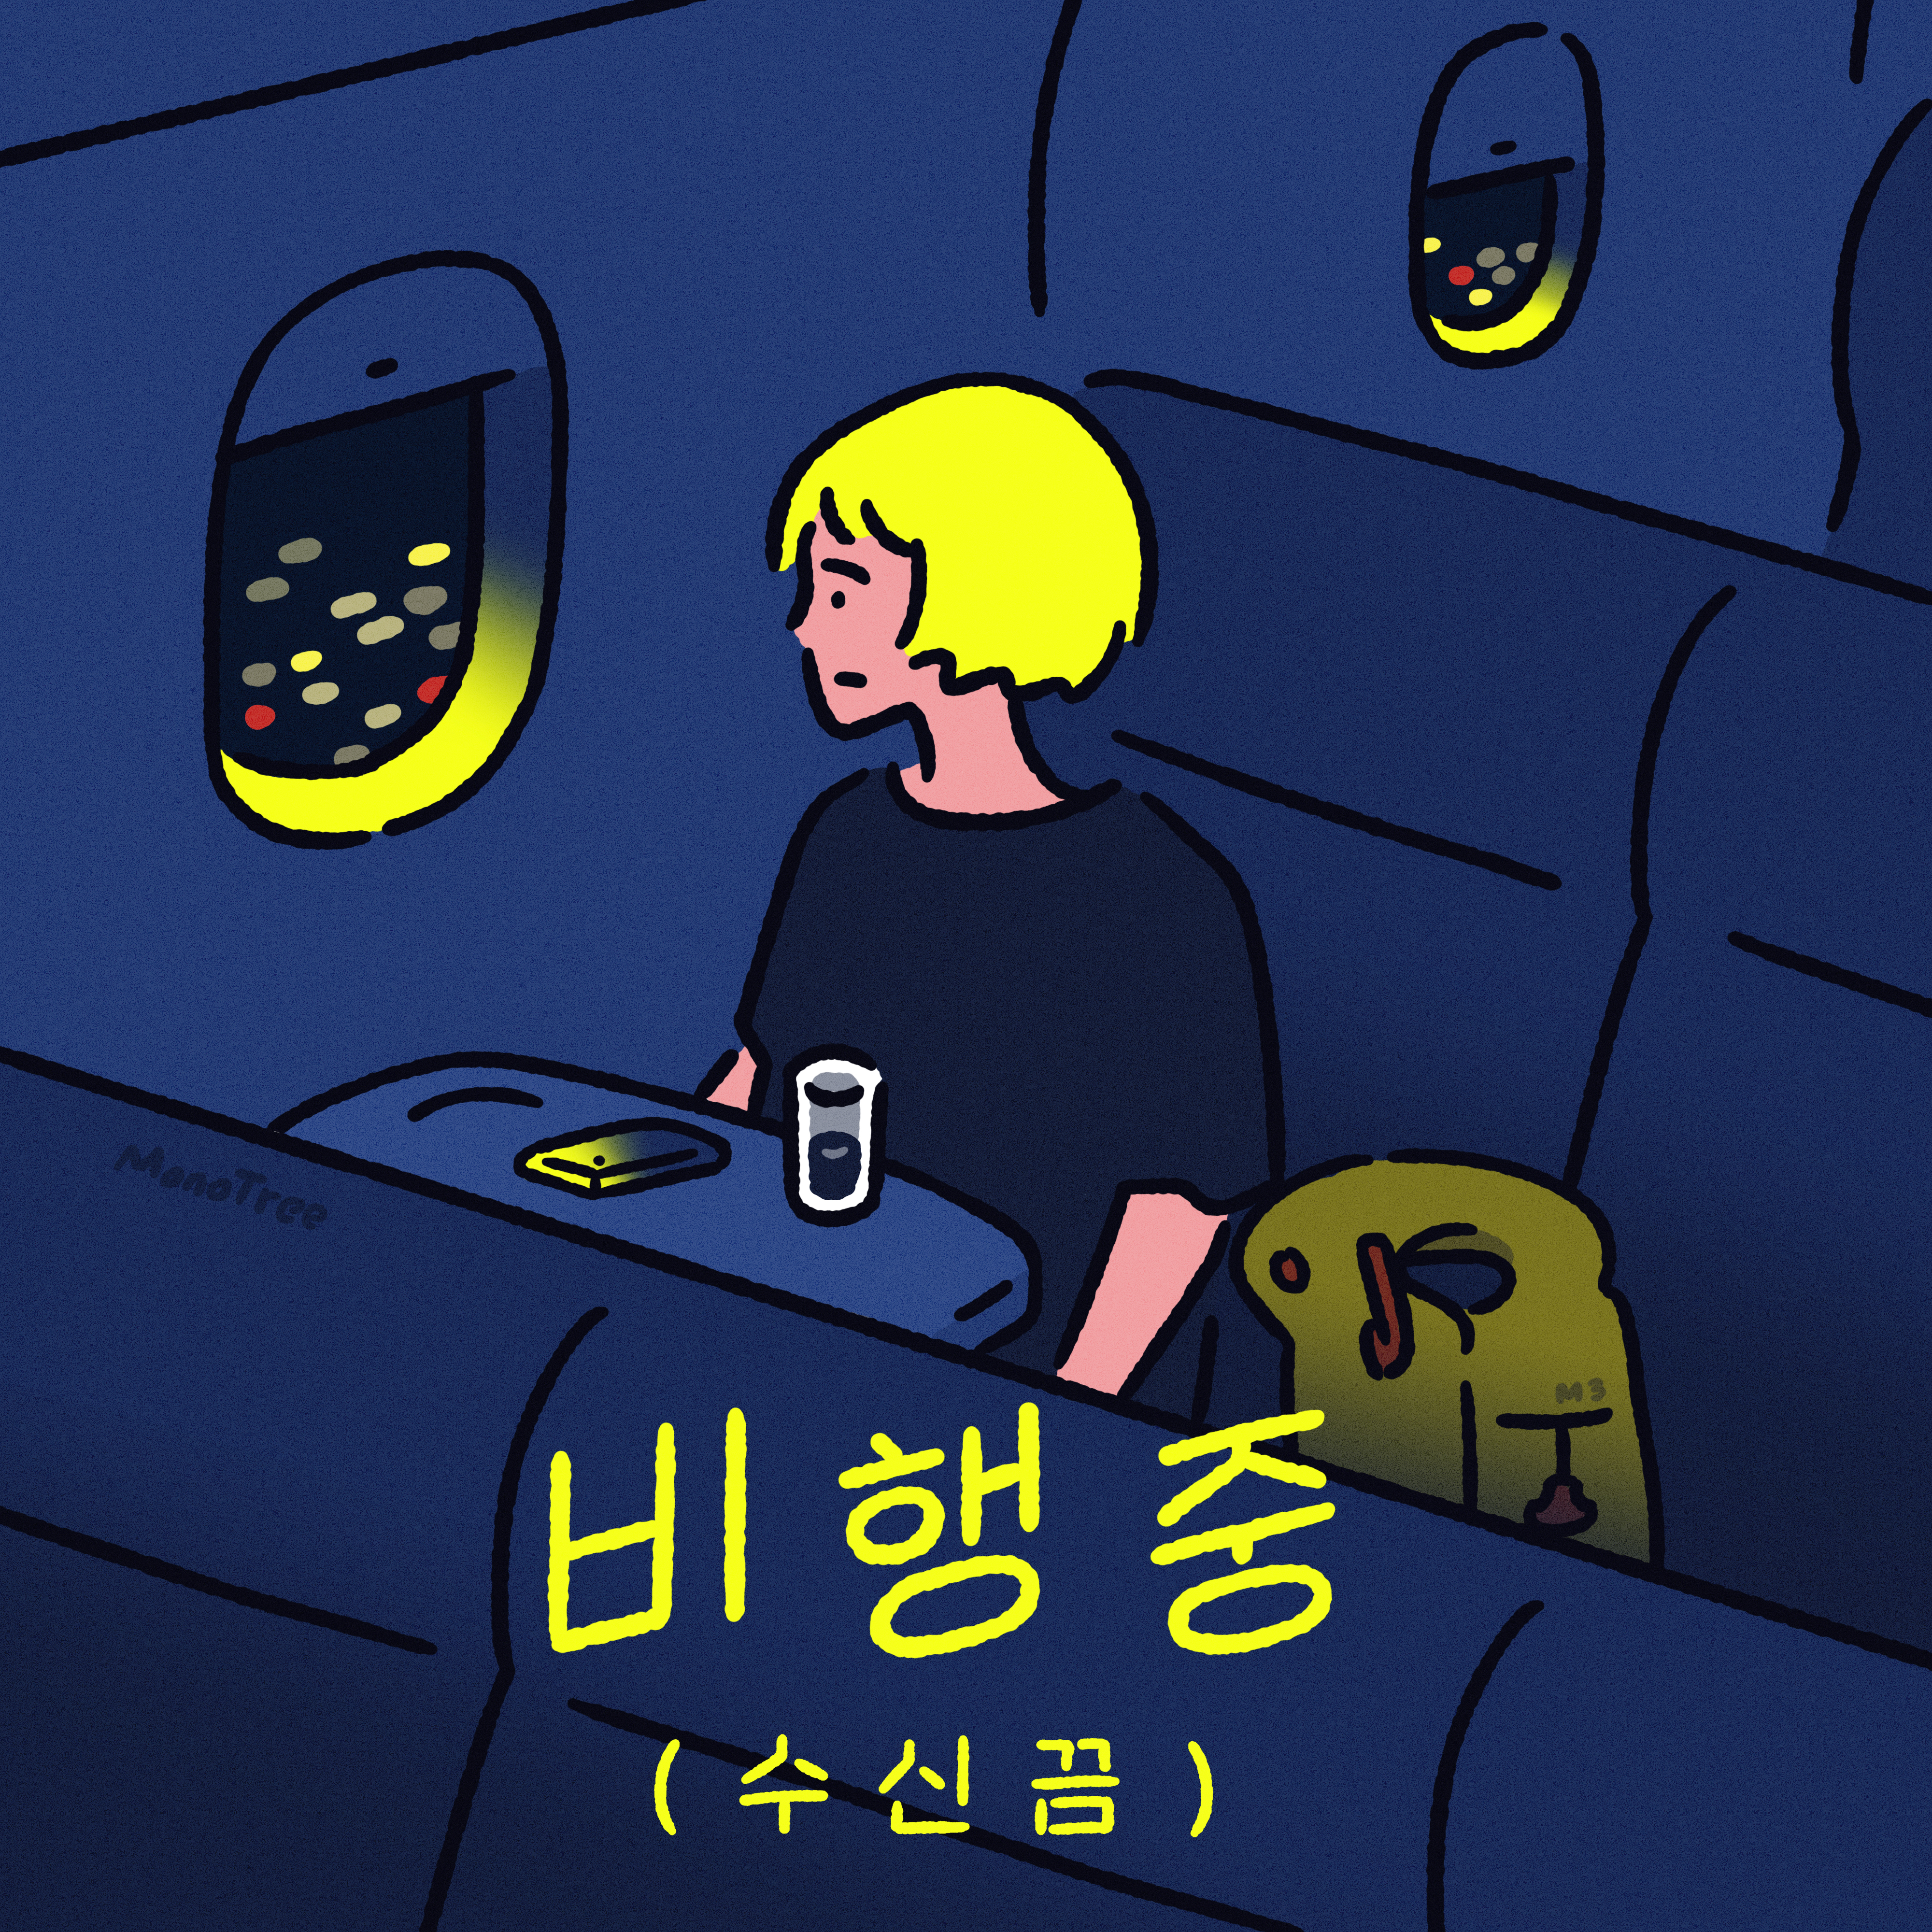 [YELO] 비행중 (수신끔)